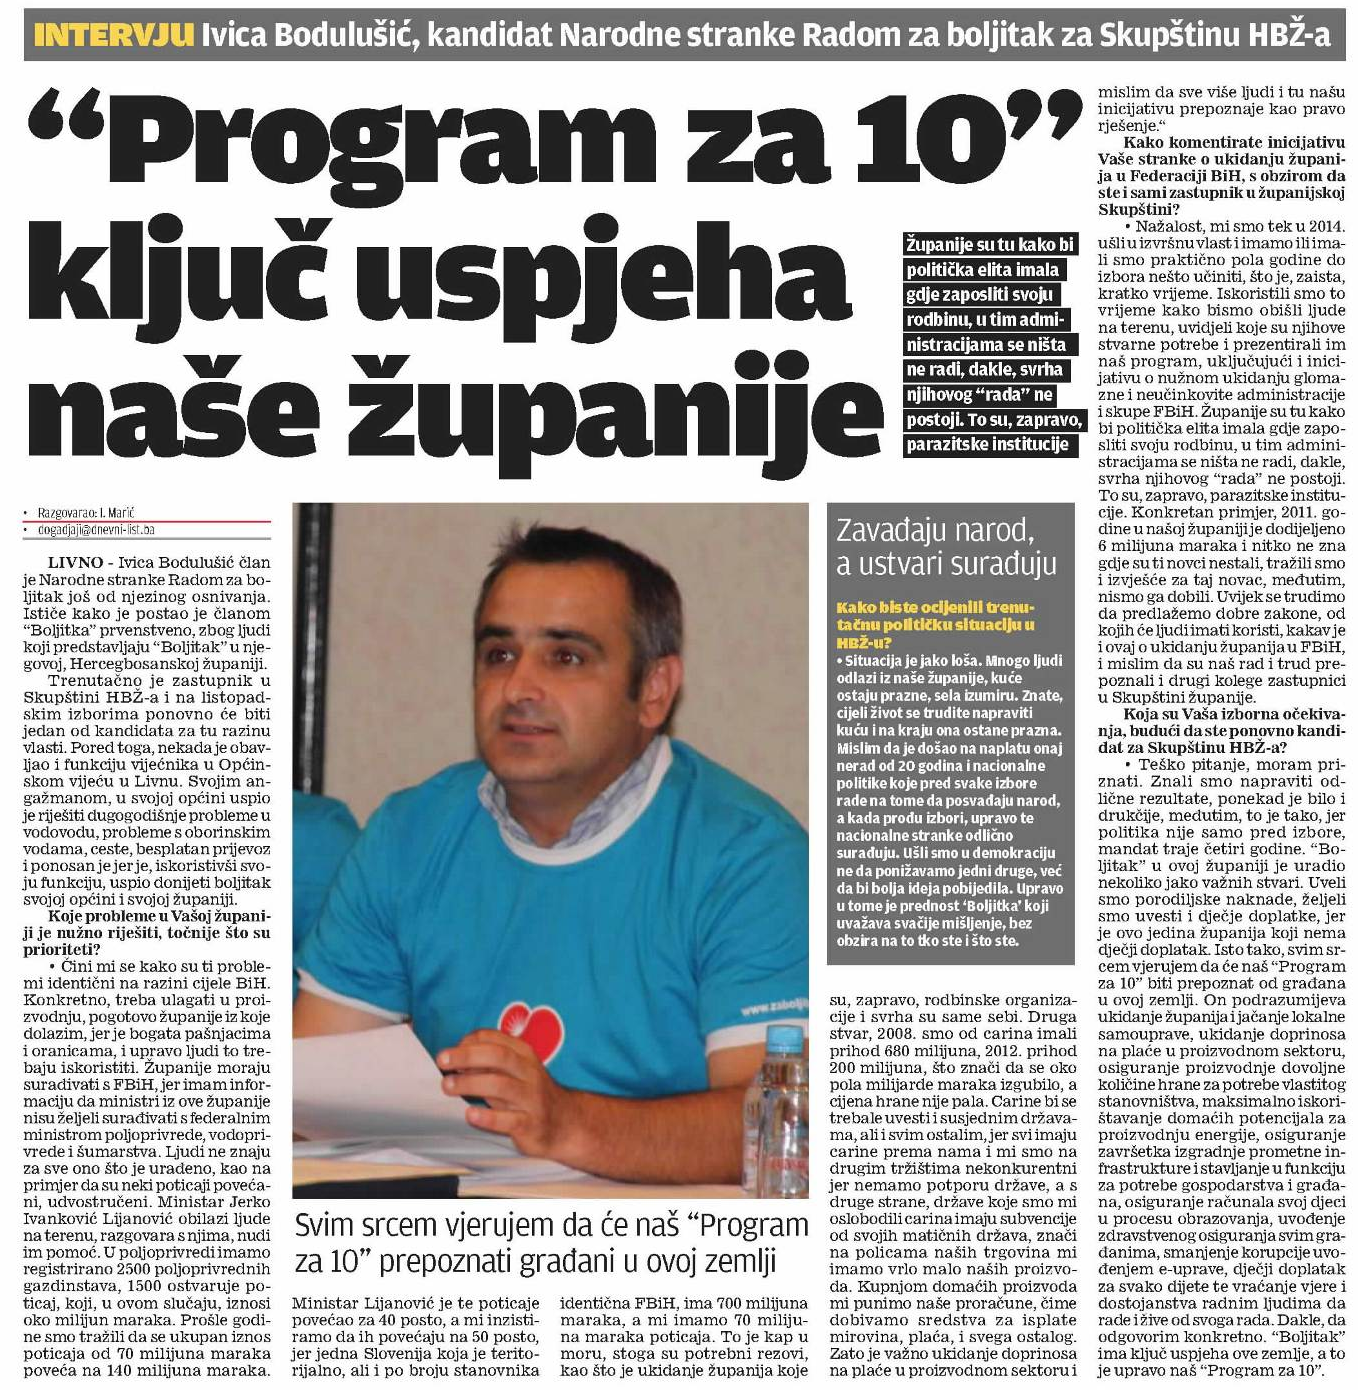 Dnevni list 23.08. strana 9